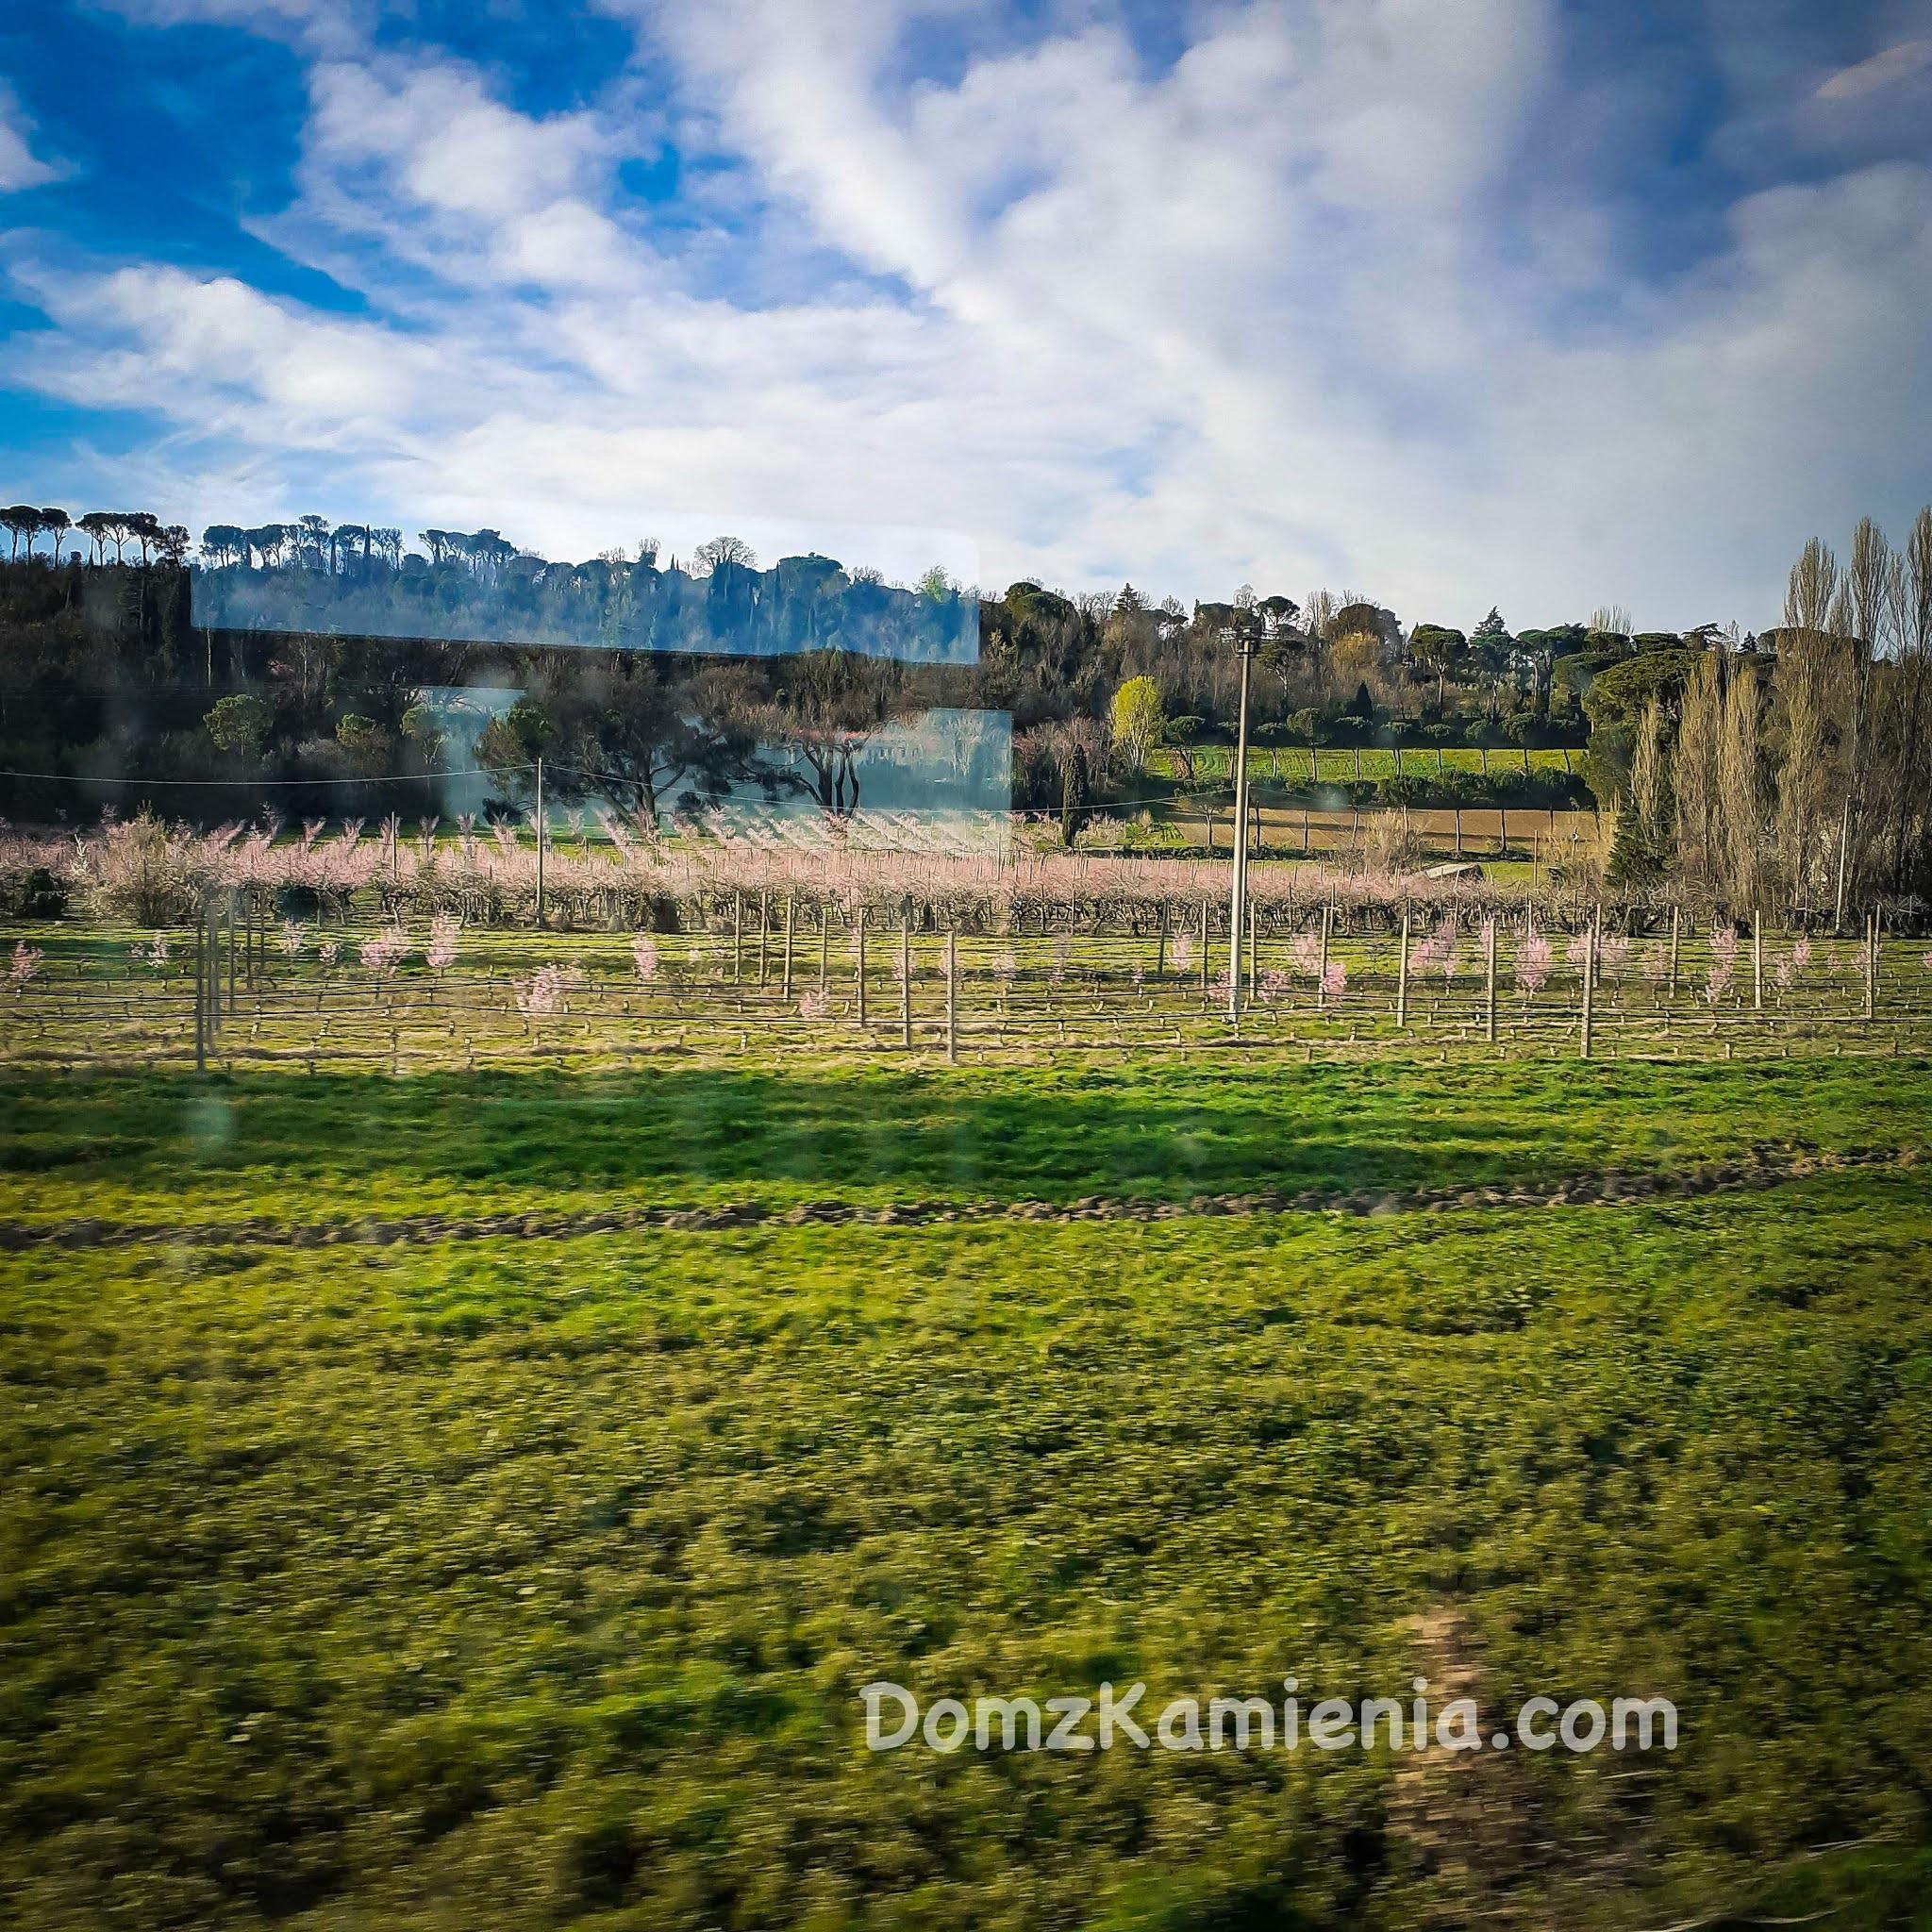 Brisighella - Dom z Kamienia, blog